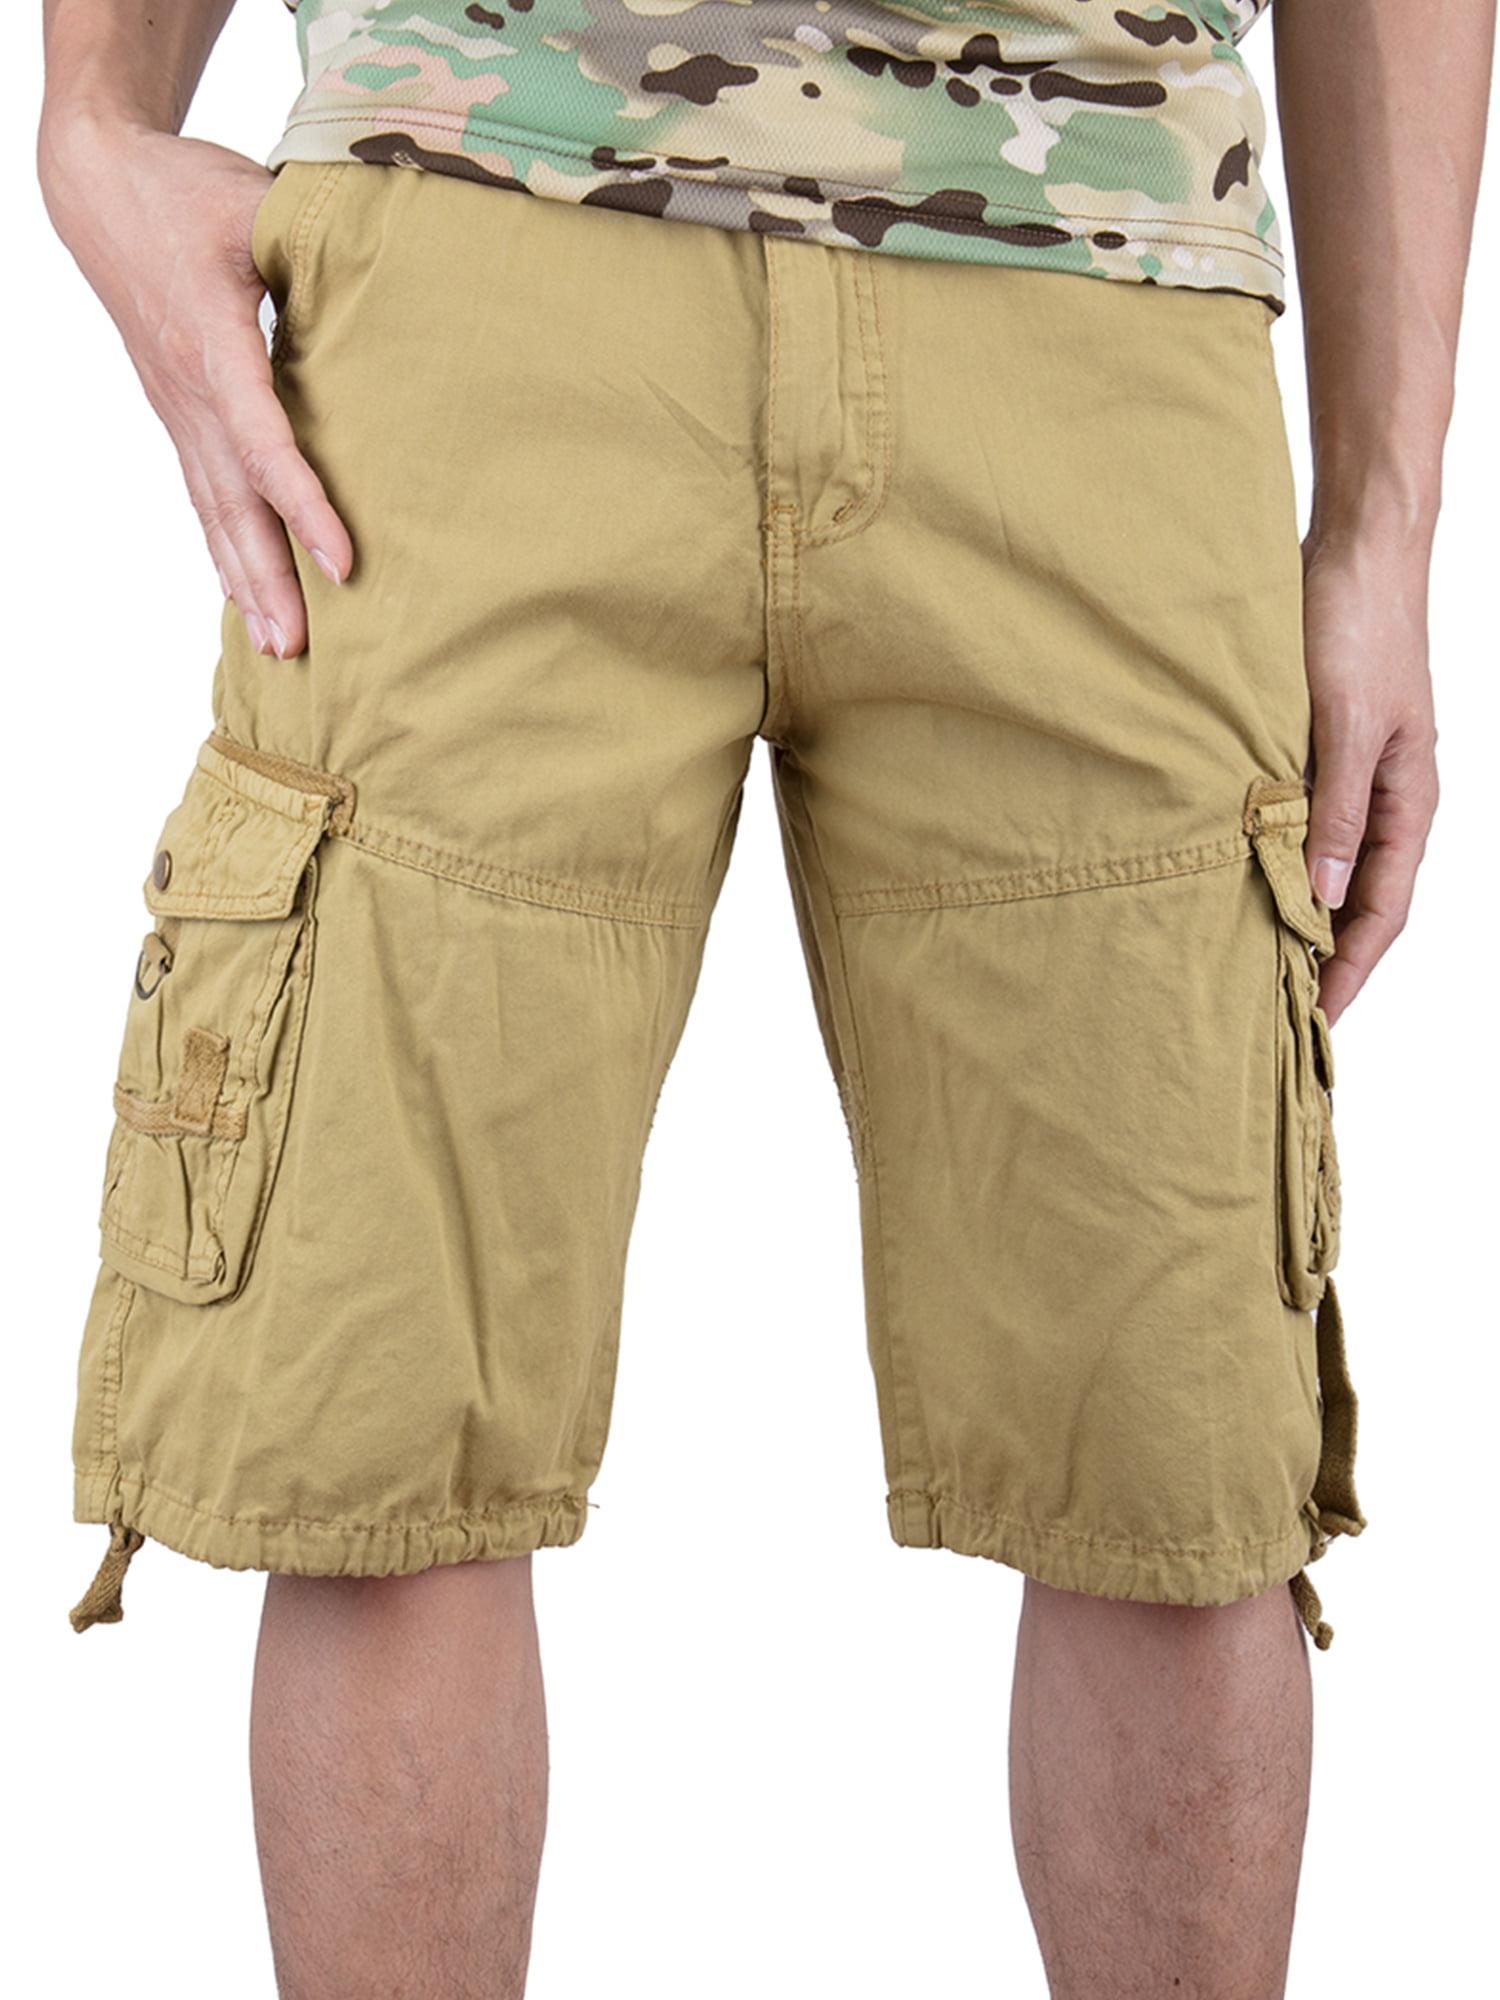 SAYFUT Men's Cotton Twill Cargo Shorts Elastic For Big Men Outdoor Wear Lightweight Plus Size Khaki Color